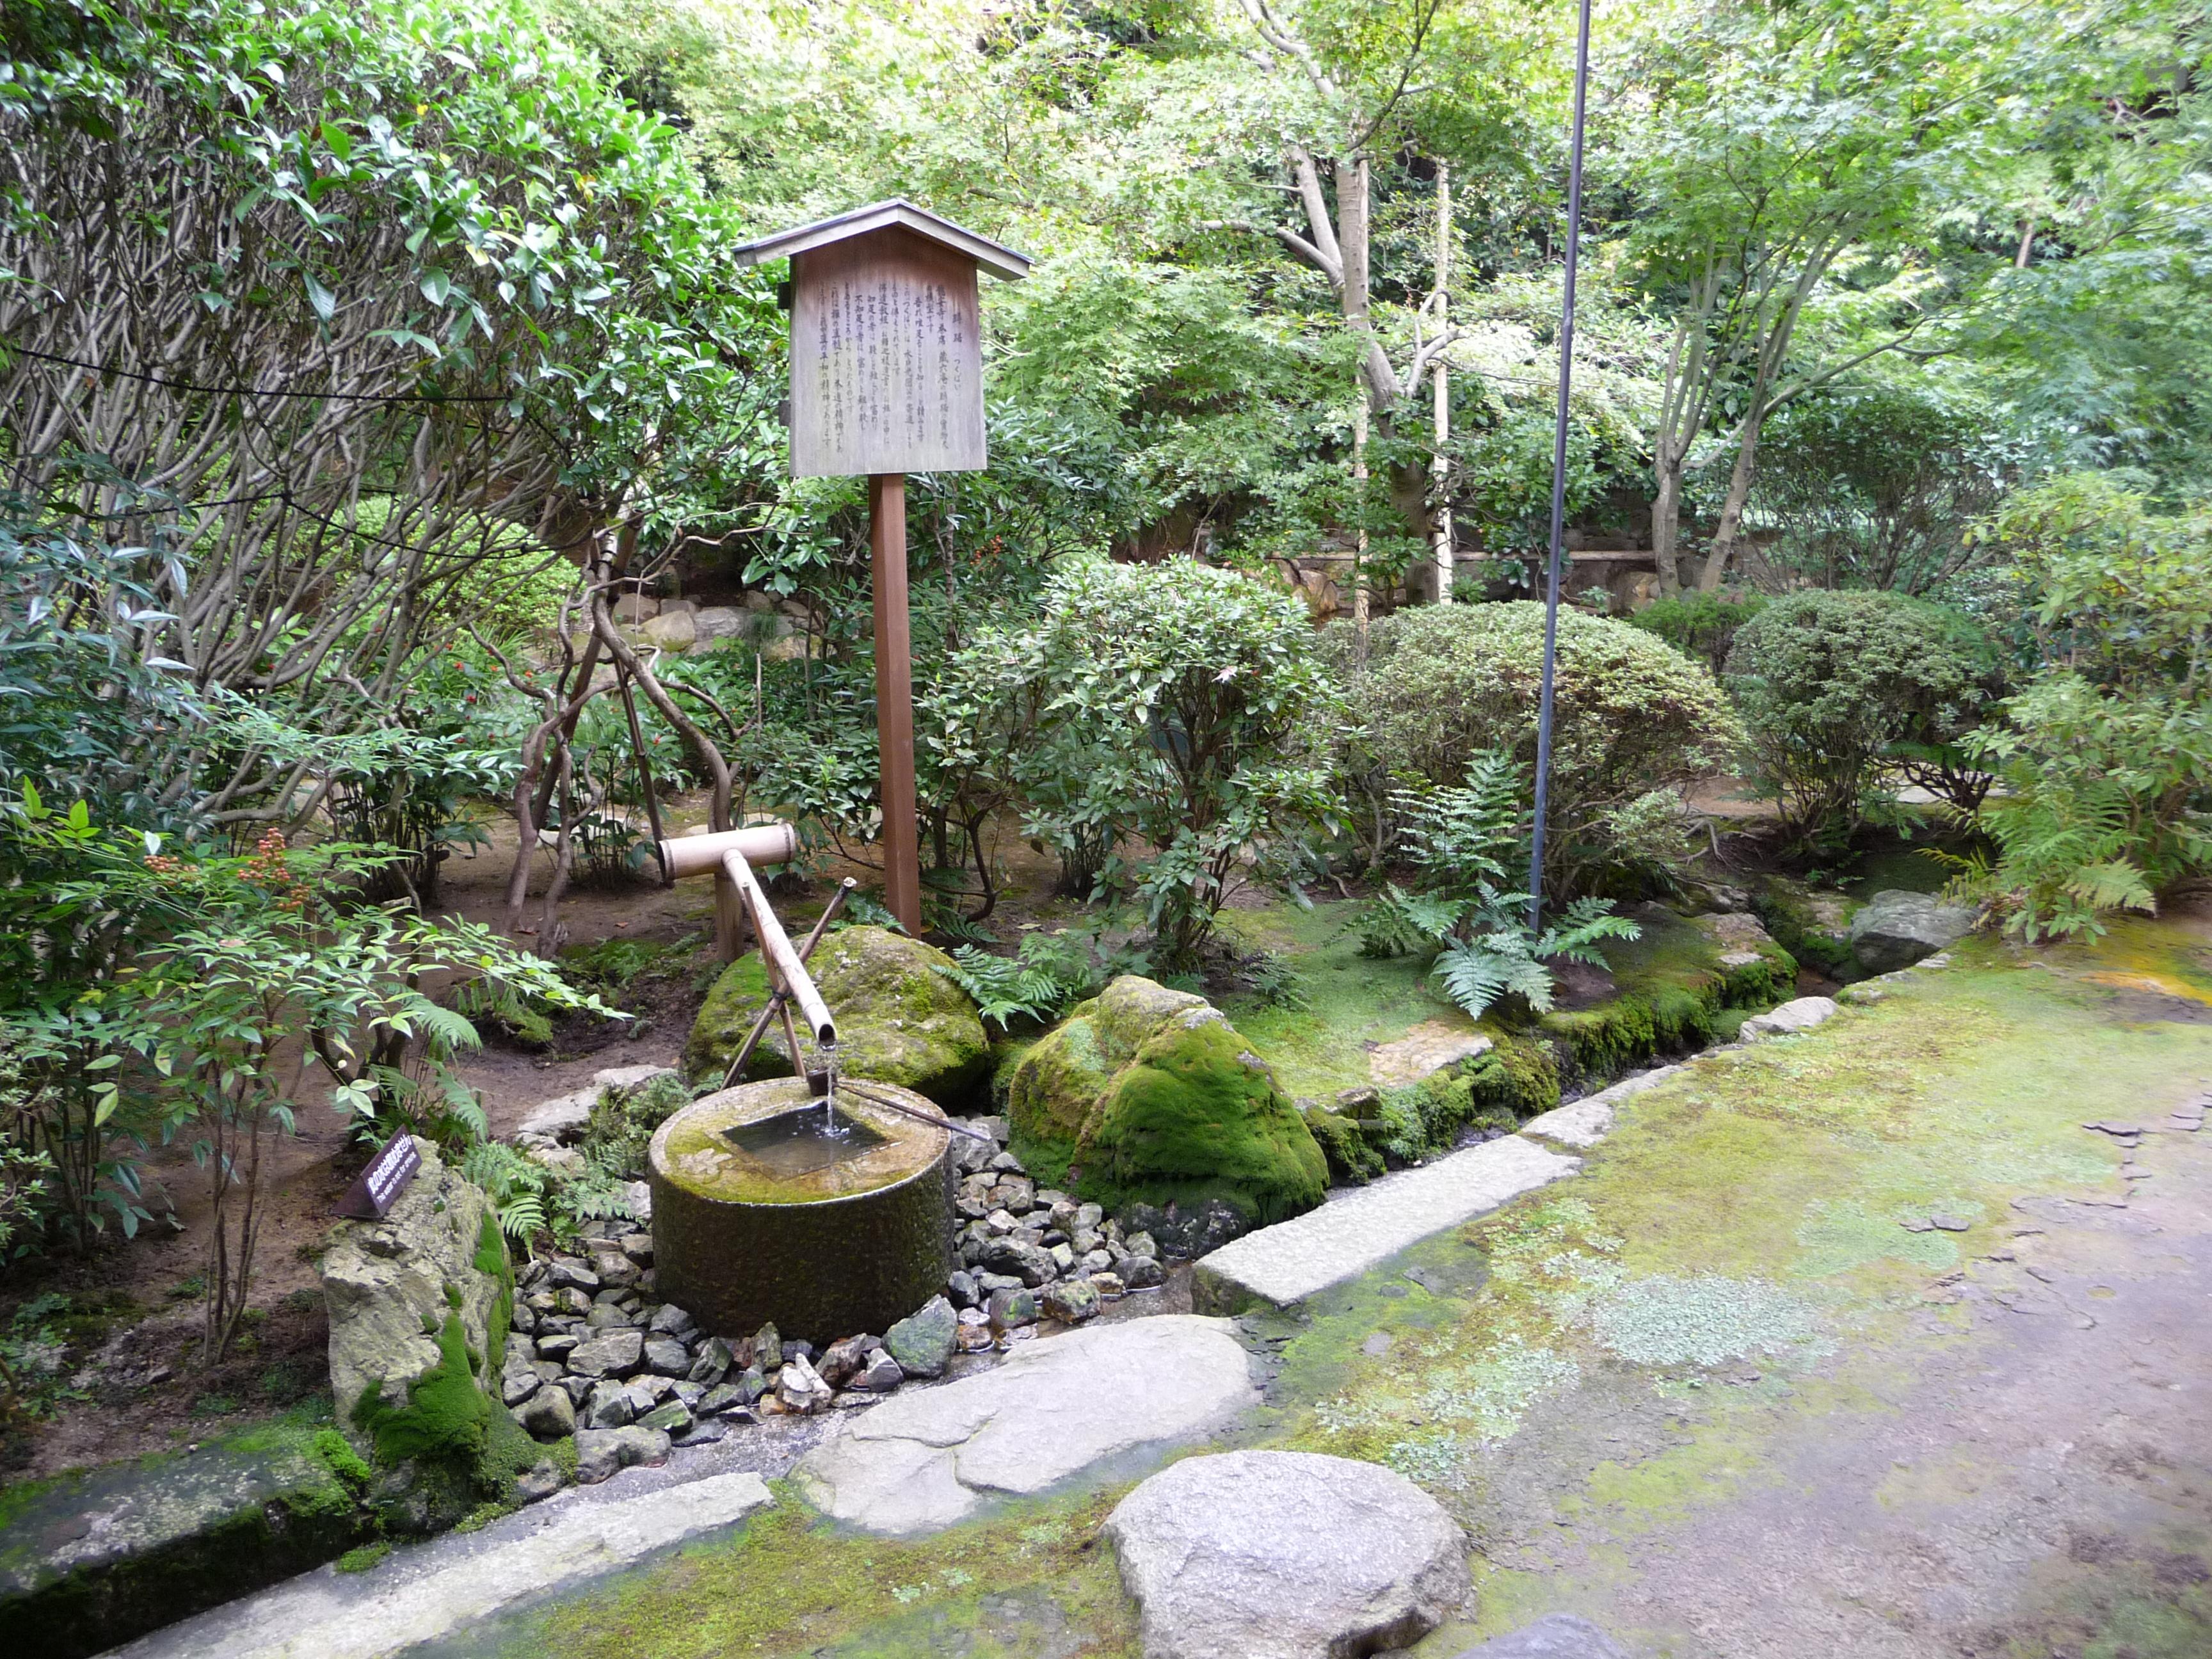 Kyoto Jour 2 : Kinkaku-Ji, Ryōan-Ji Et Ginkakuji | フランス人 à Fontaine Jardin Japonais